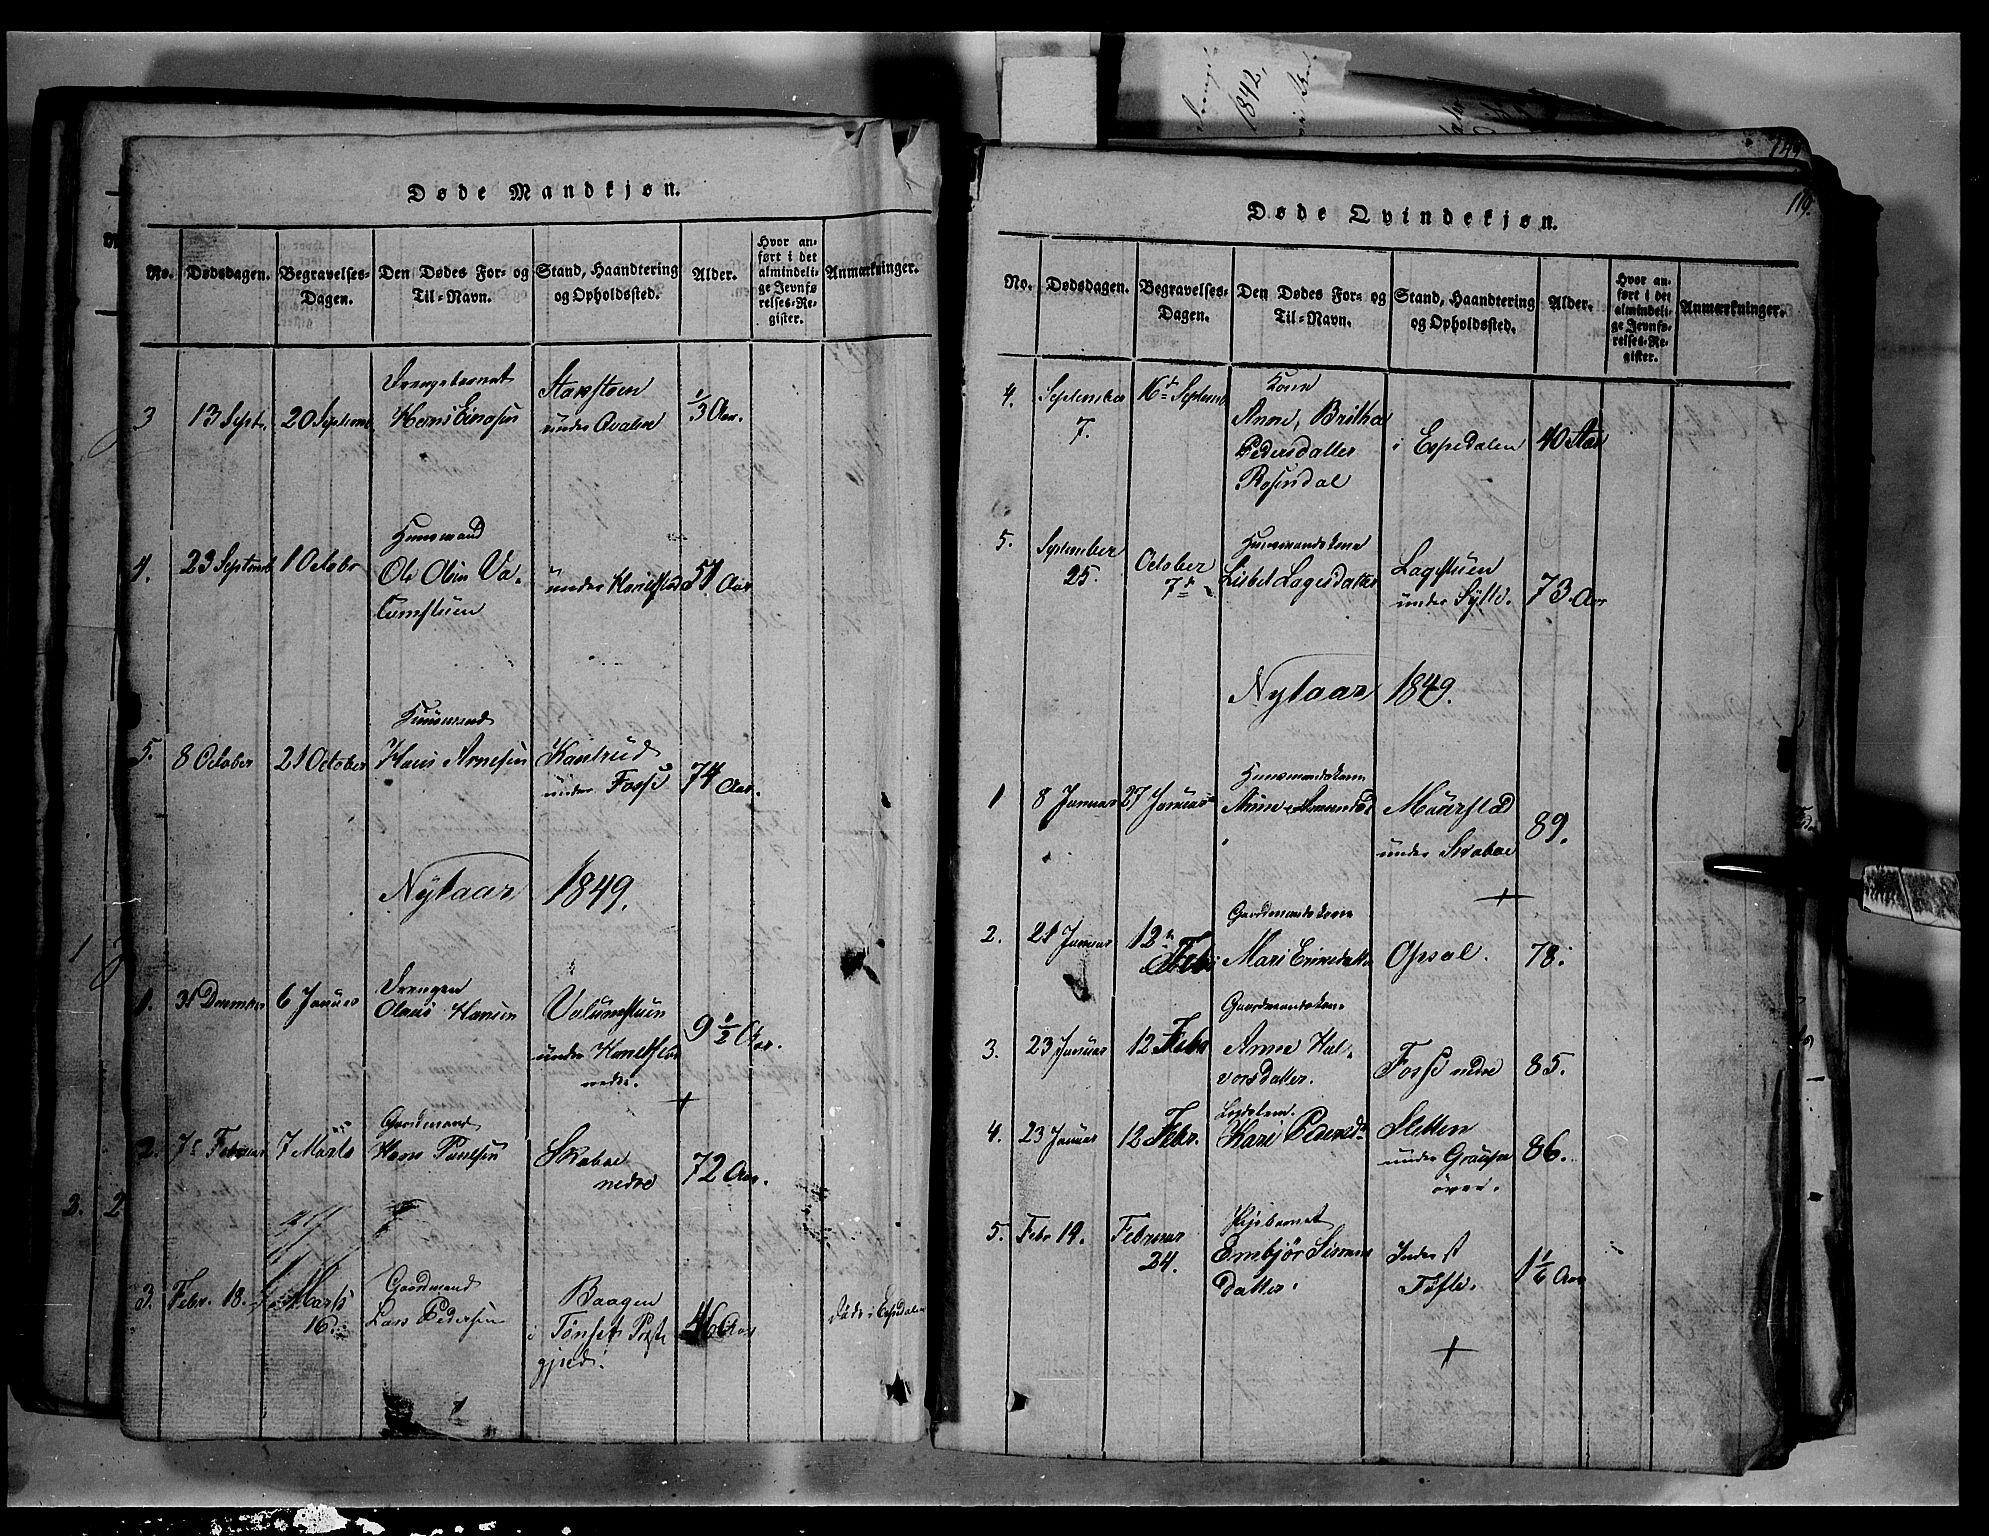 SAH, Fron prestekontor, H/Ha/Hab/L0003: Klokkerbok nr. 3, 1816-1850, s. 119